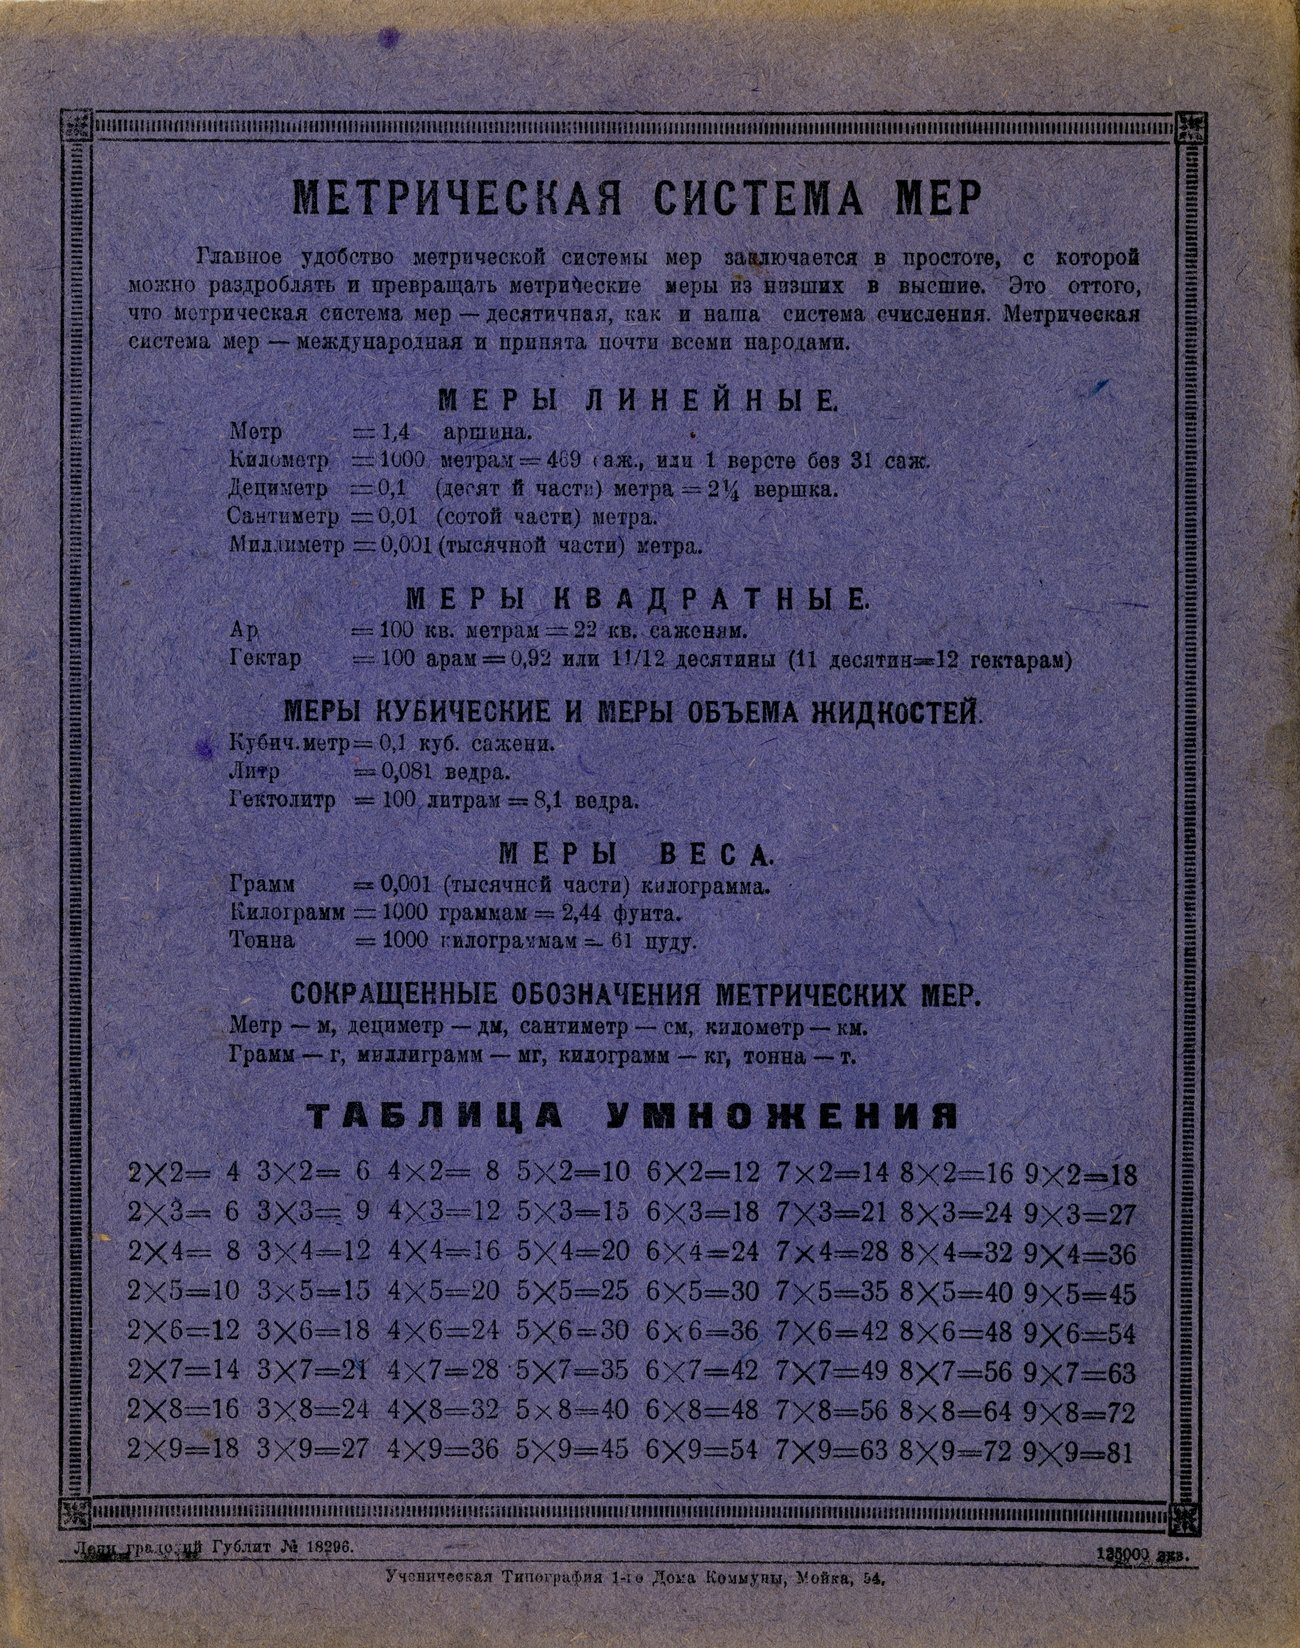 Тетрадь СССР 028 оборот